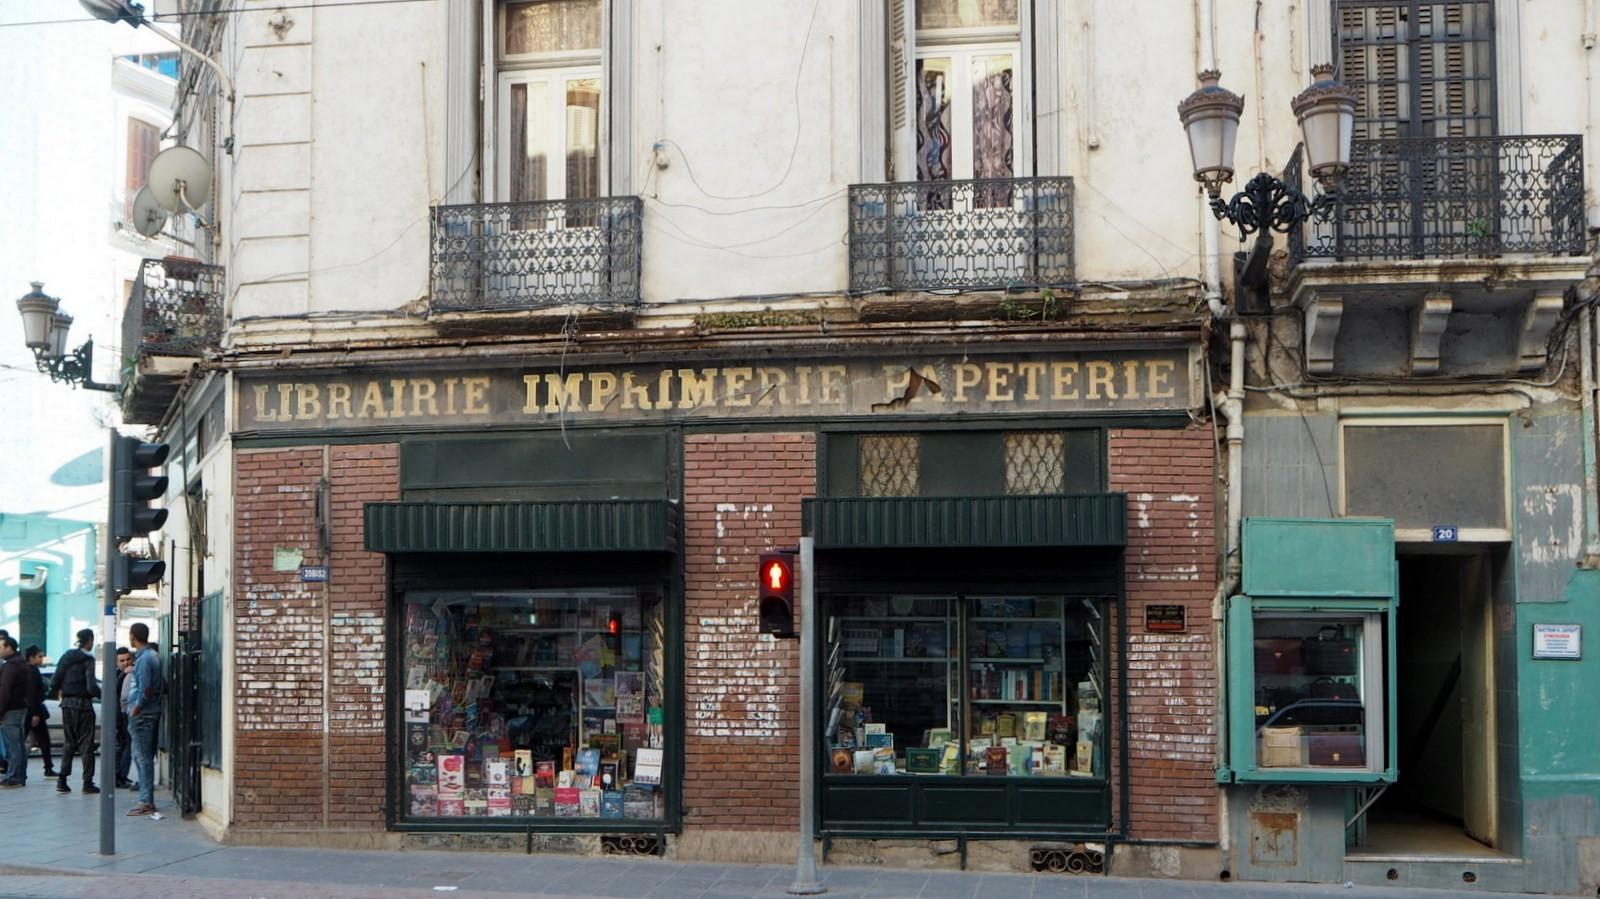 Kirjakauppa Oranissa